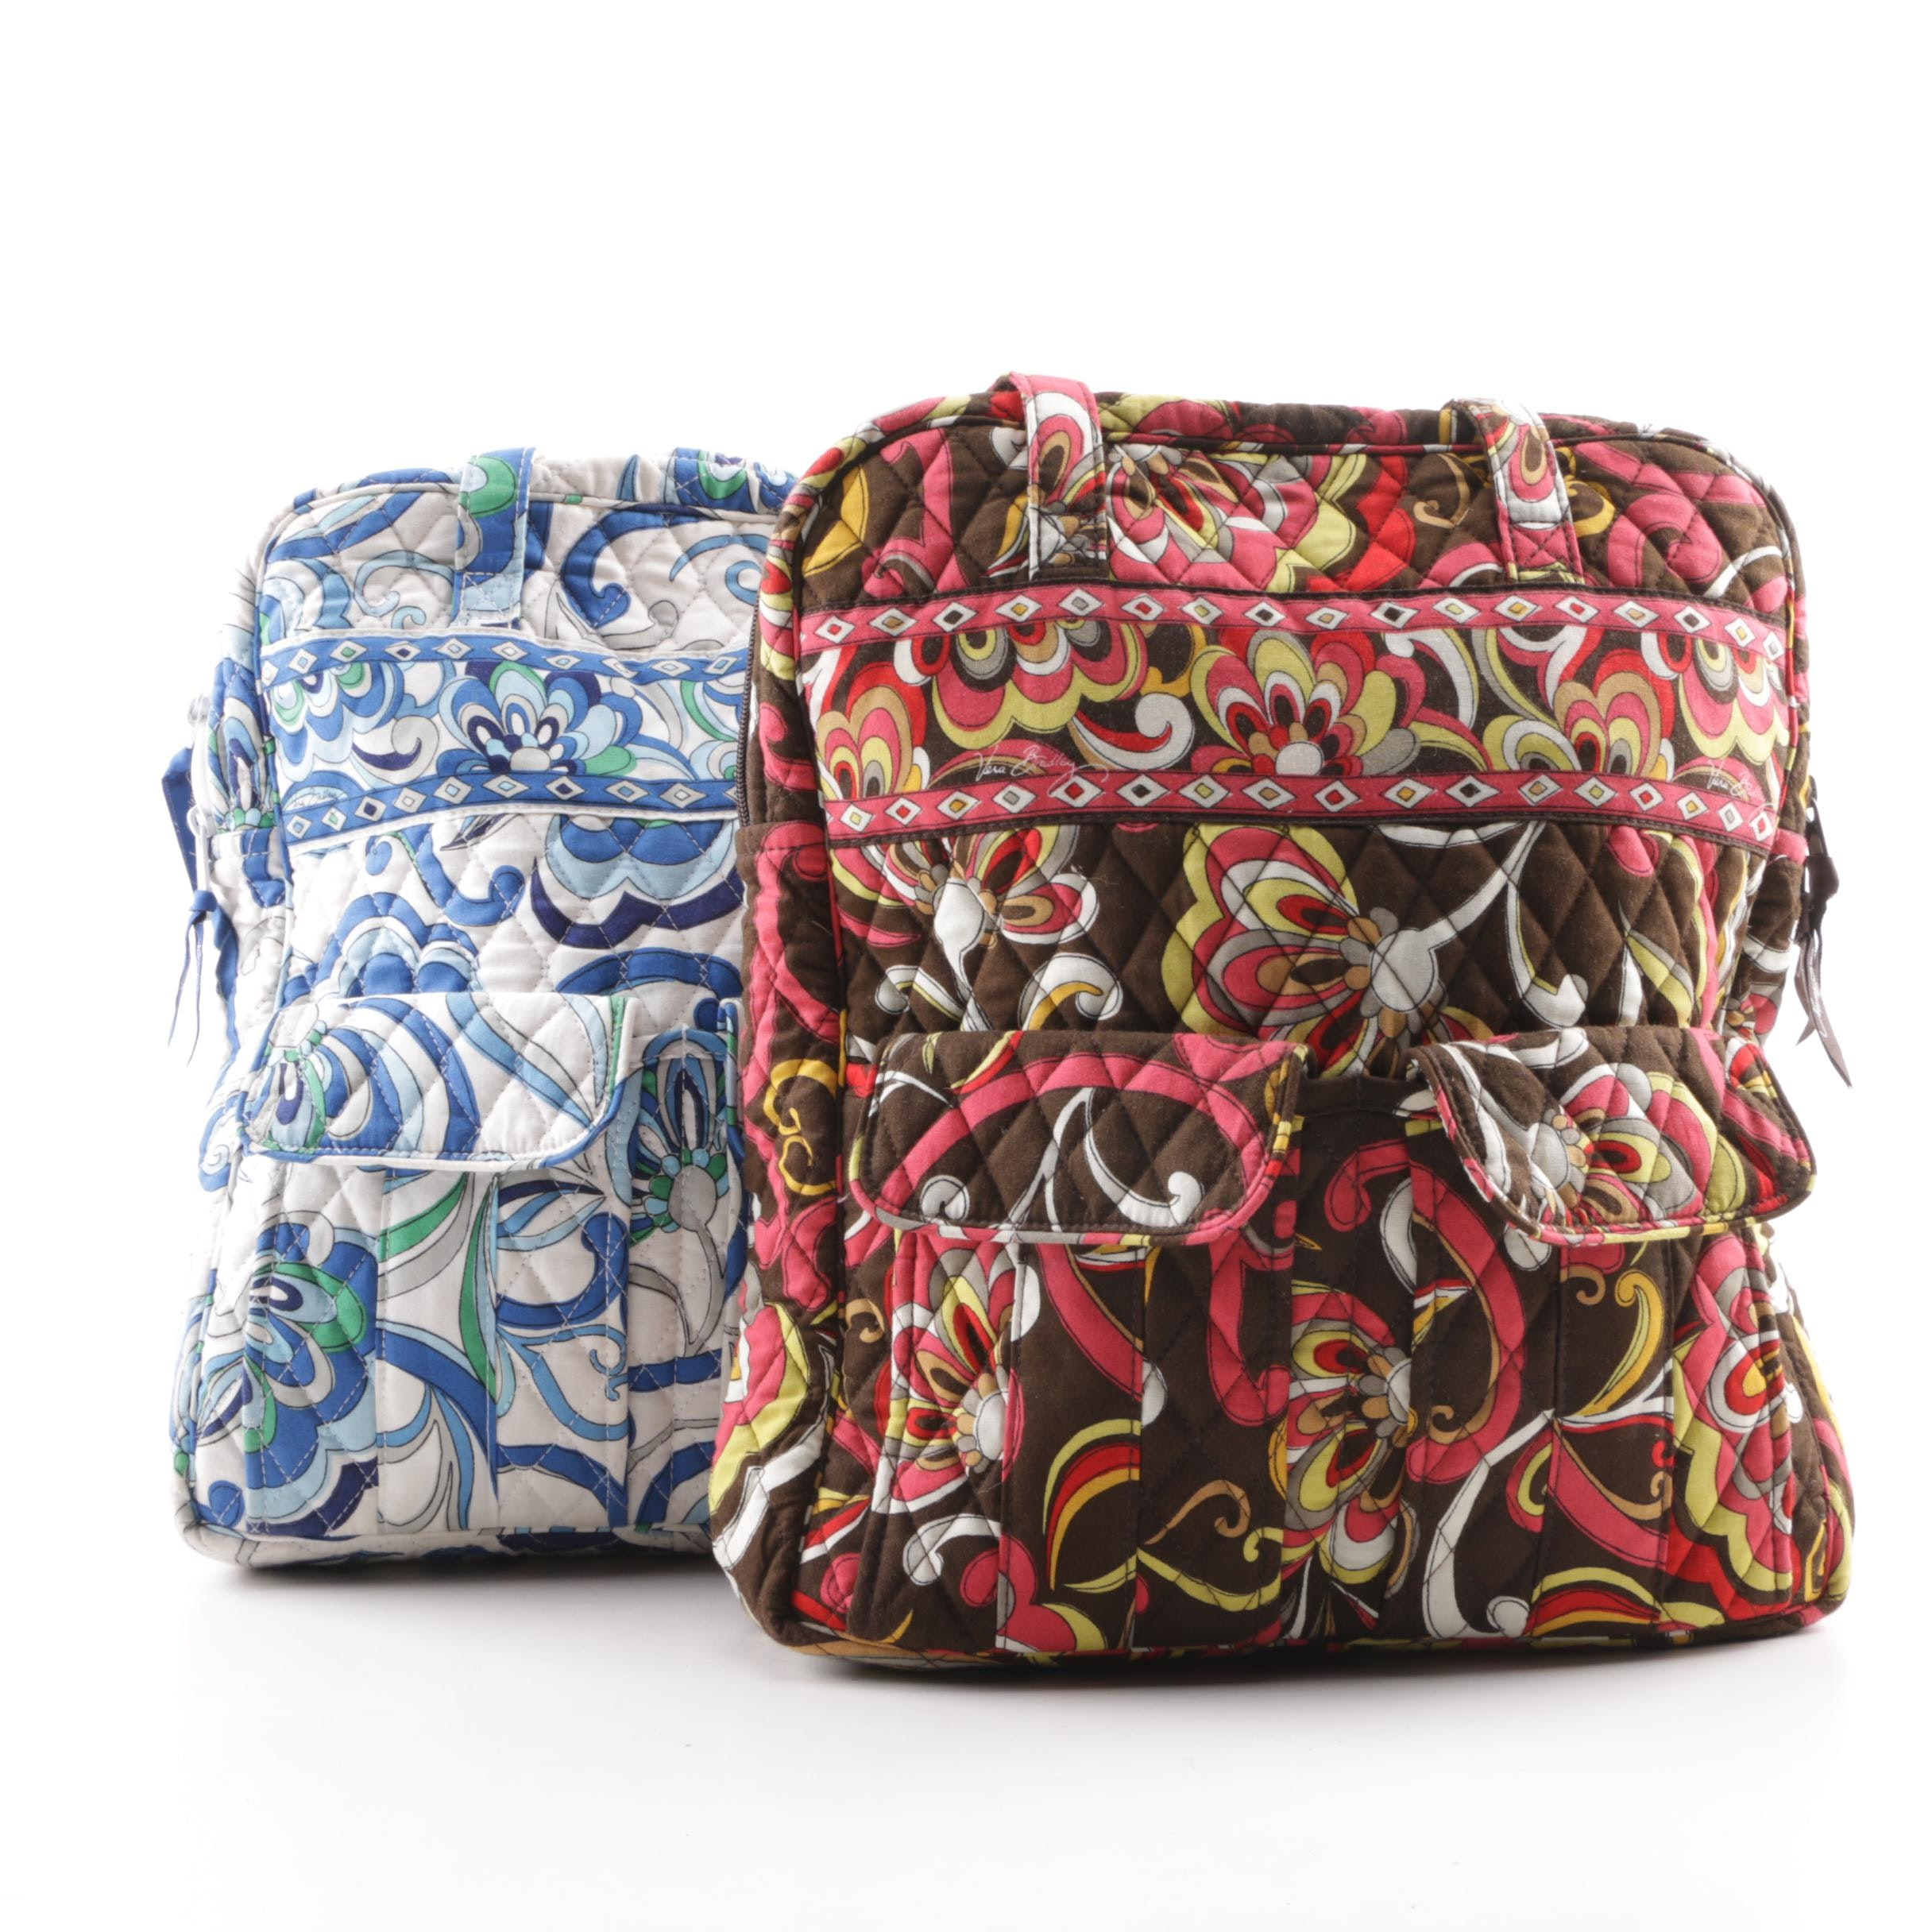 Vera Bradley Quilted Cotton Print Shoulder Bags